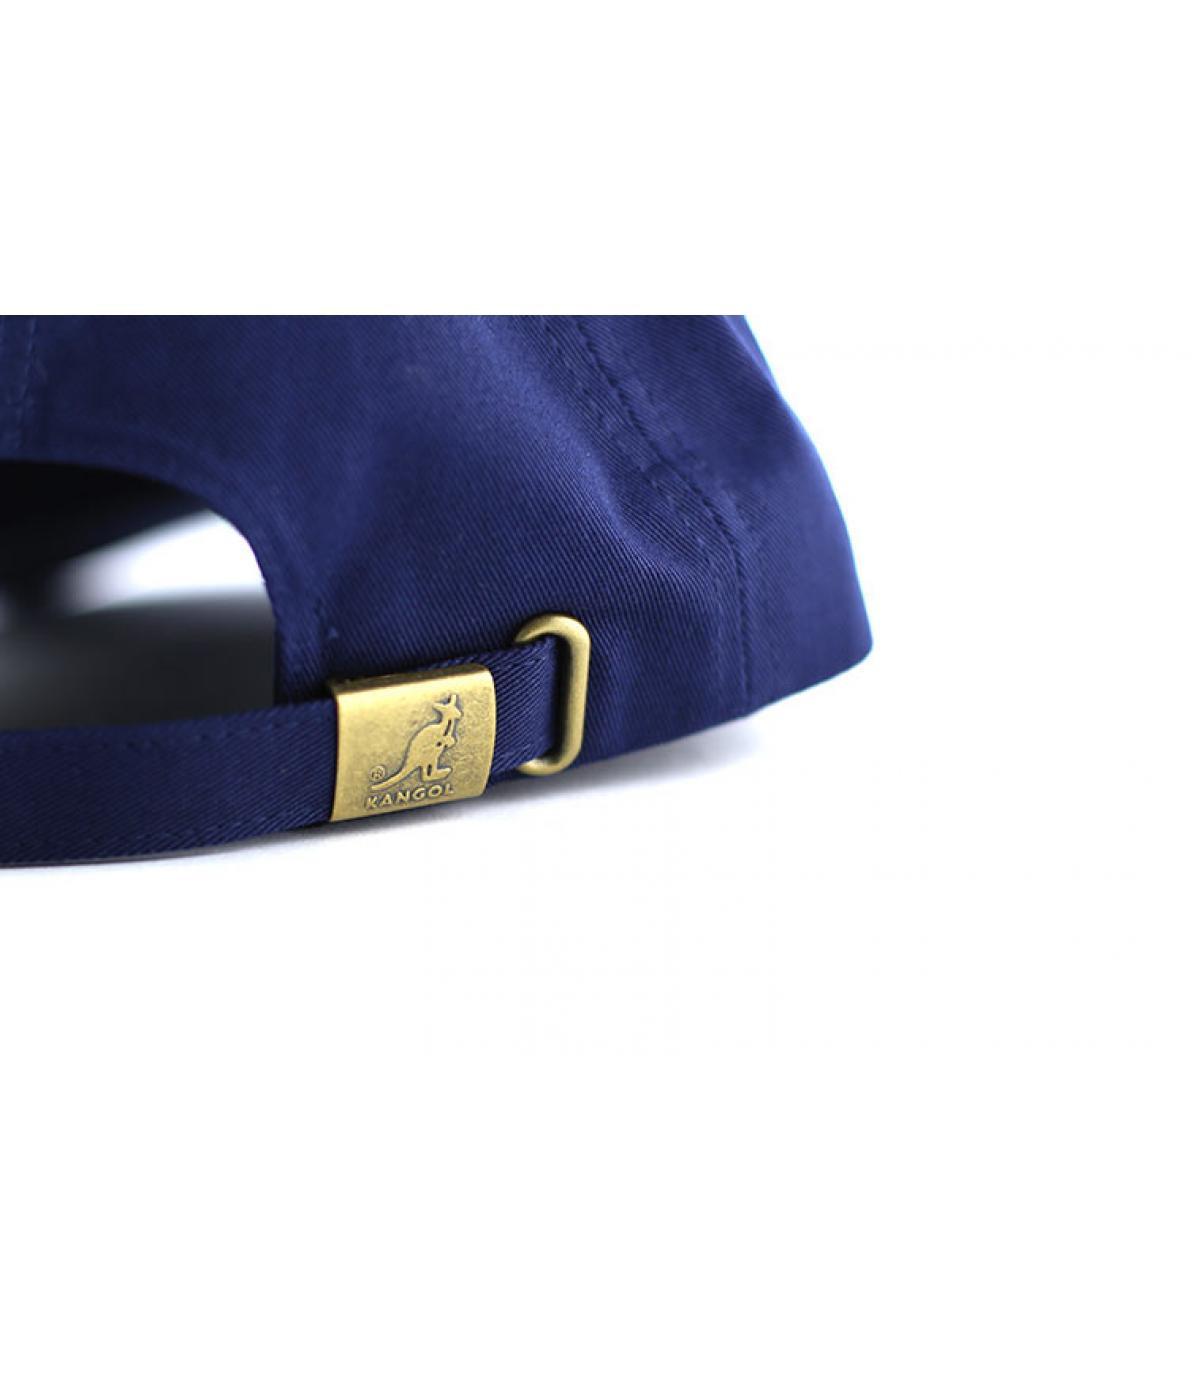 Détails Cotton adjustable baseball bleu marine - image 6